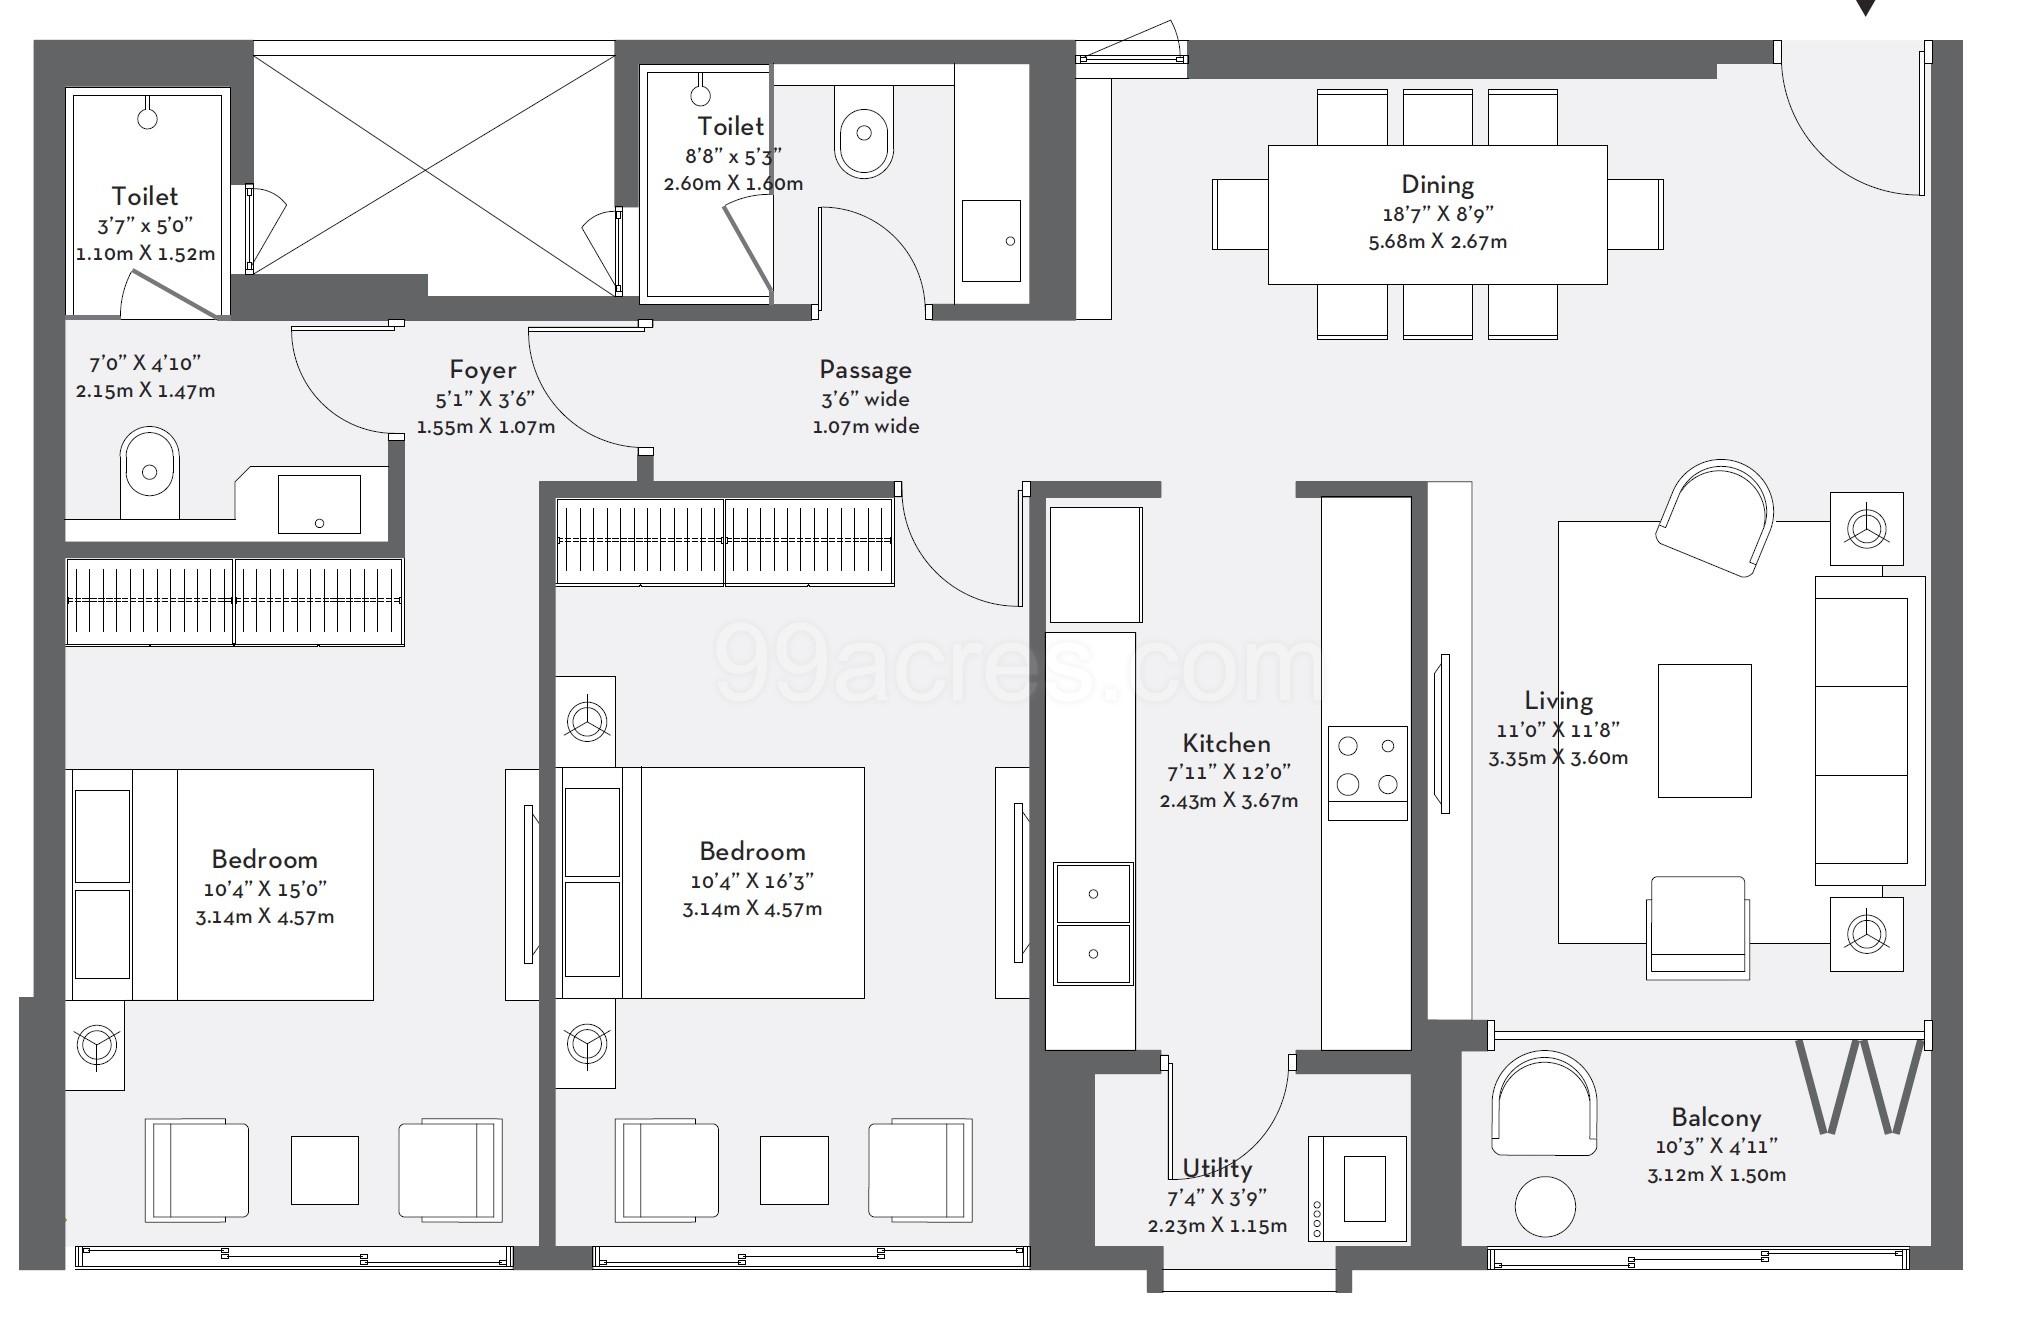 or5iz6od Top Result 50 New 7 Bedroom House Plans Gallery 2017 Hgd6